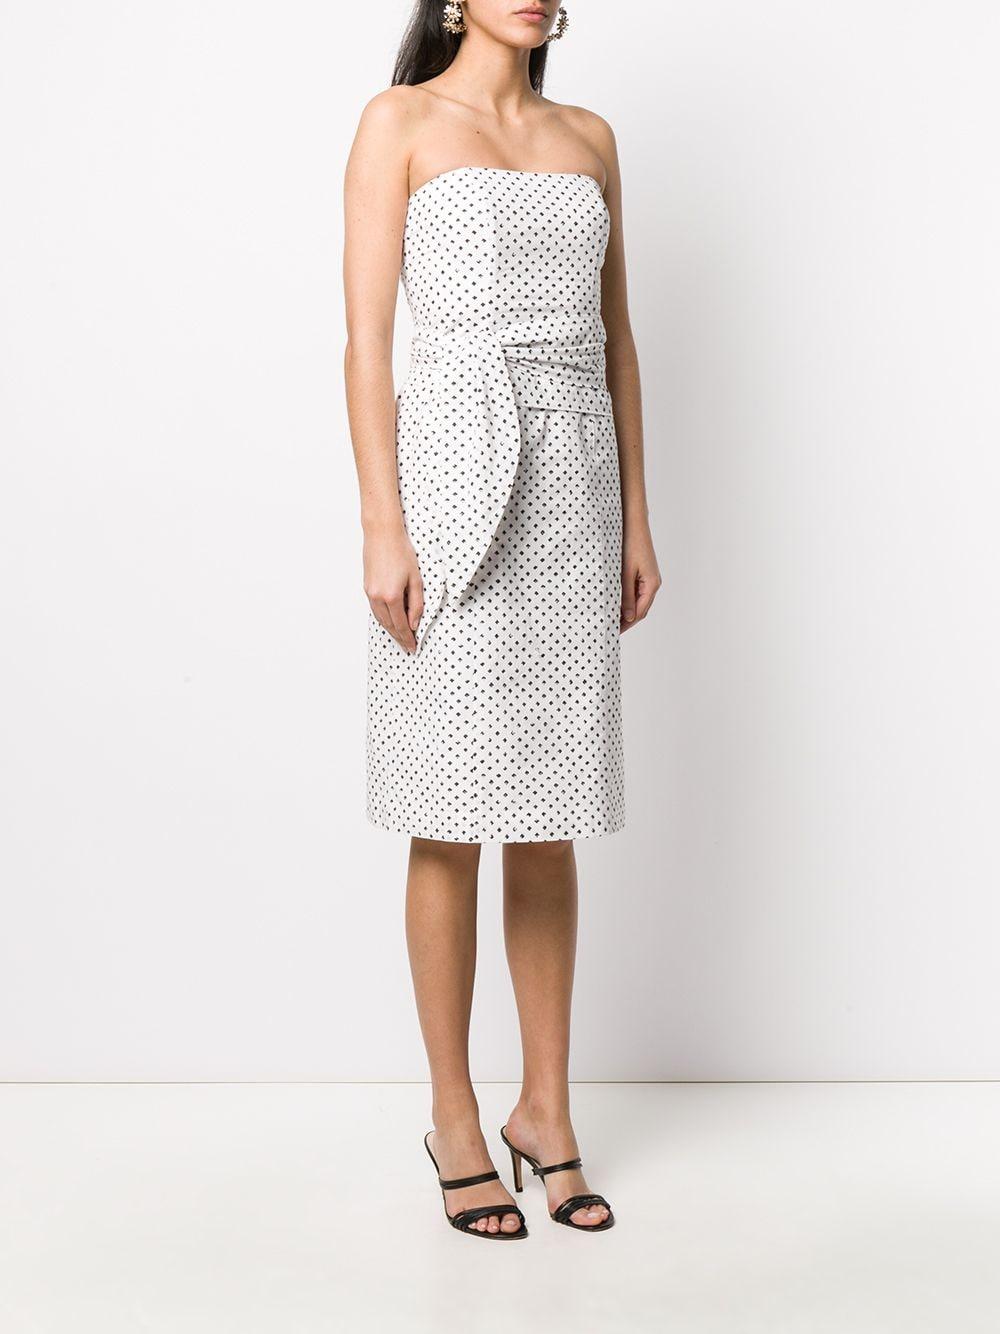 FEDERICA TOSI | Dress | FTE20AB064.0TE0058088